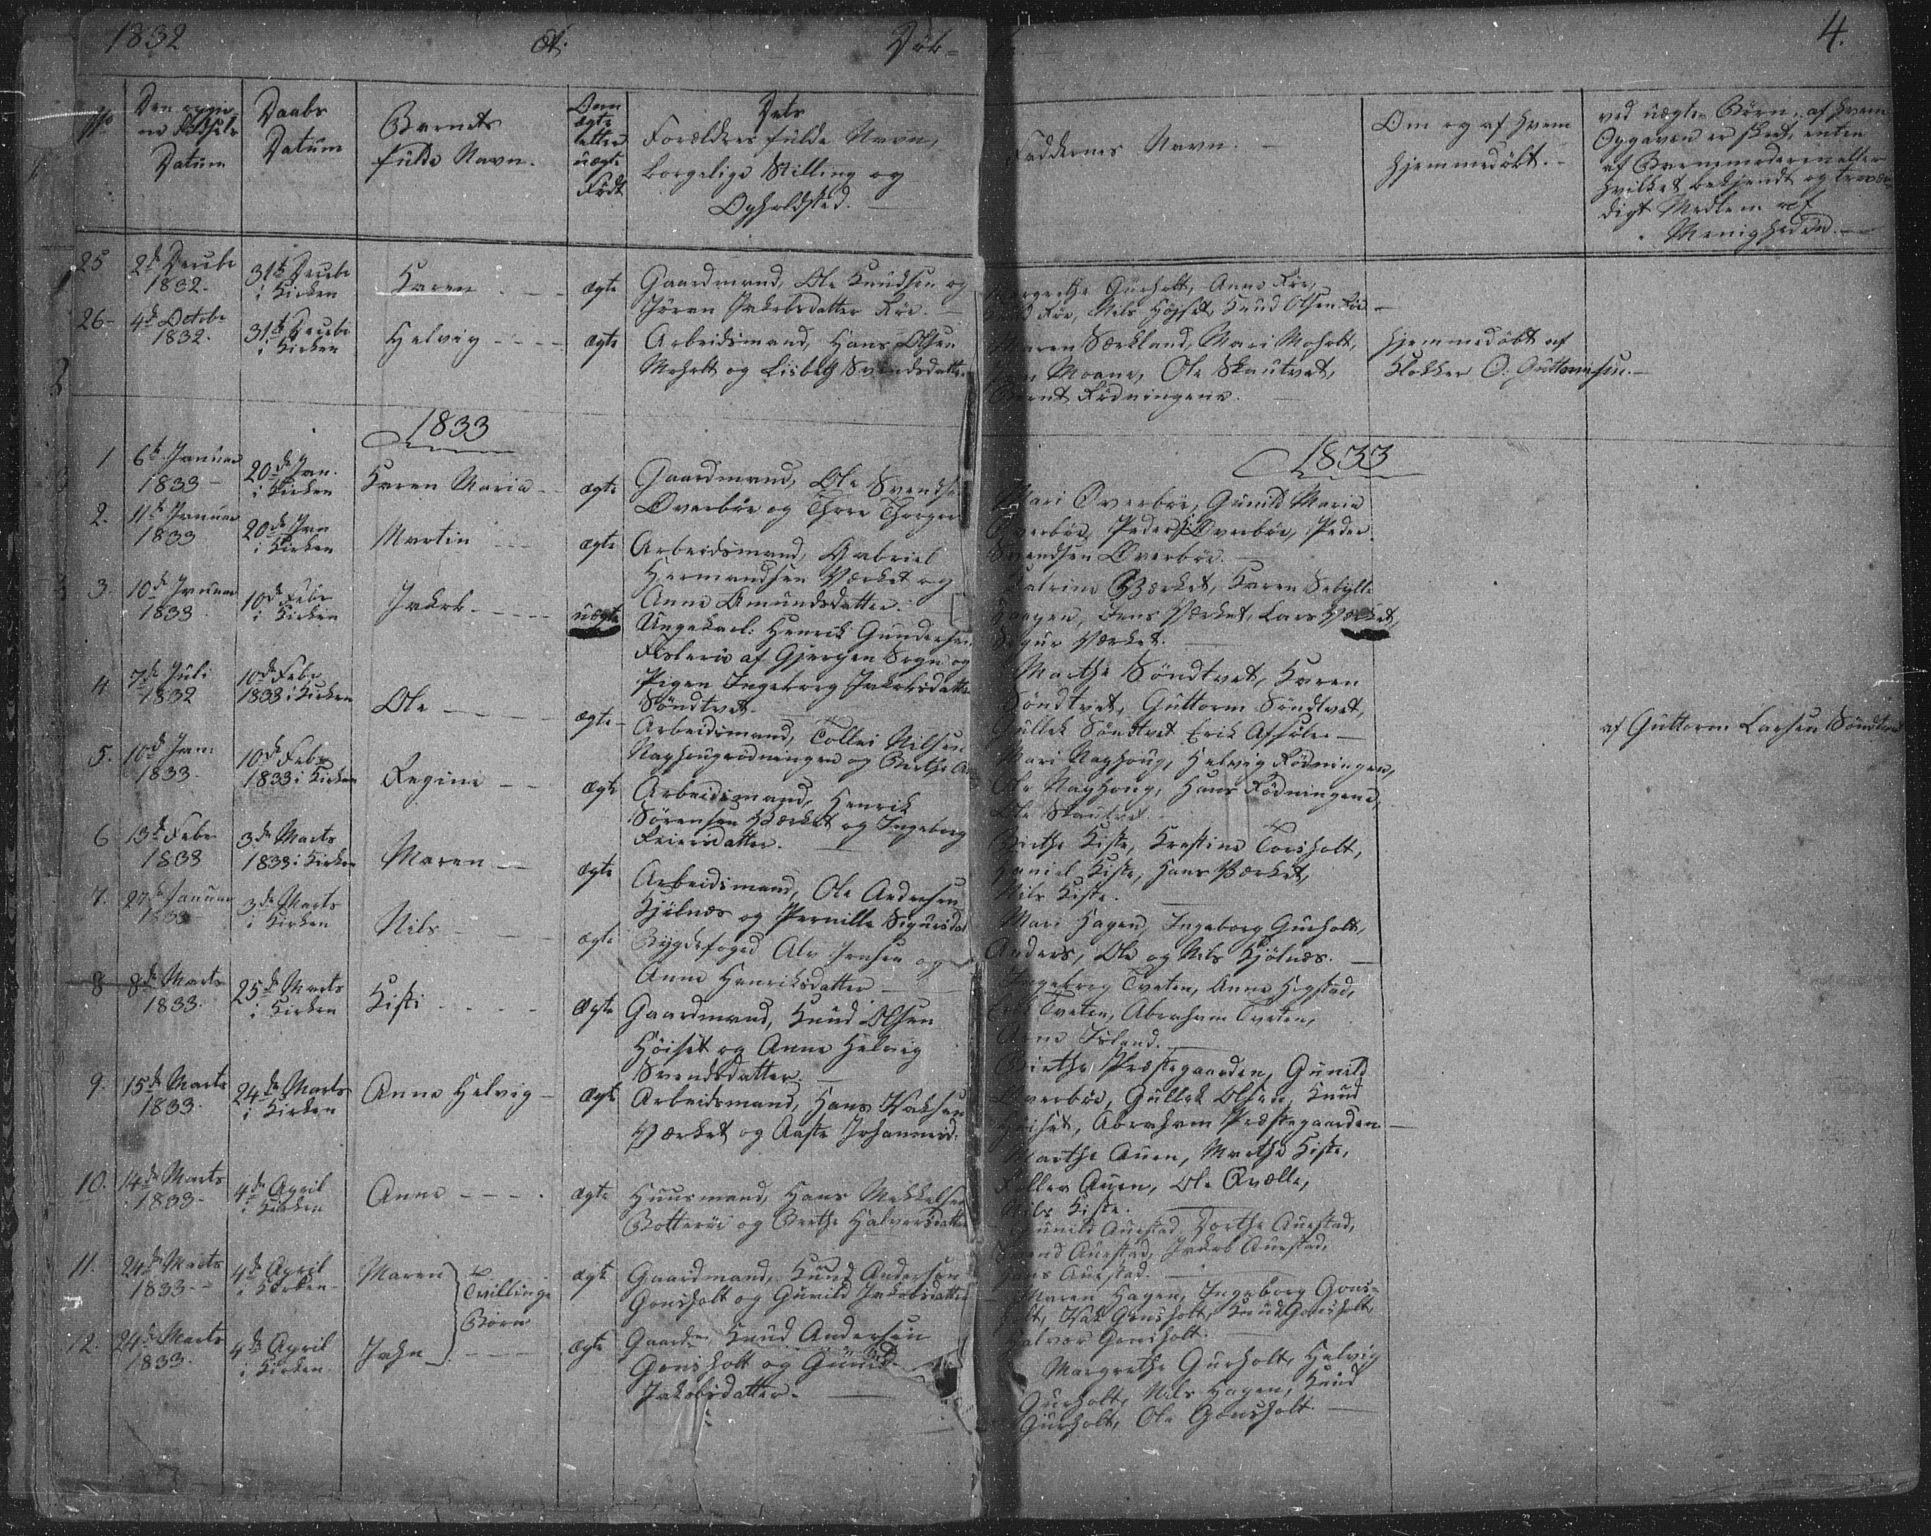 SAKO, Siljan kirkebøker, F/Fa/L0001: Parish register (official) no. 1, 1831-1870, p. 4